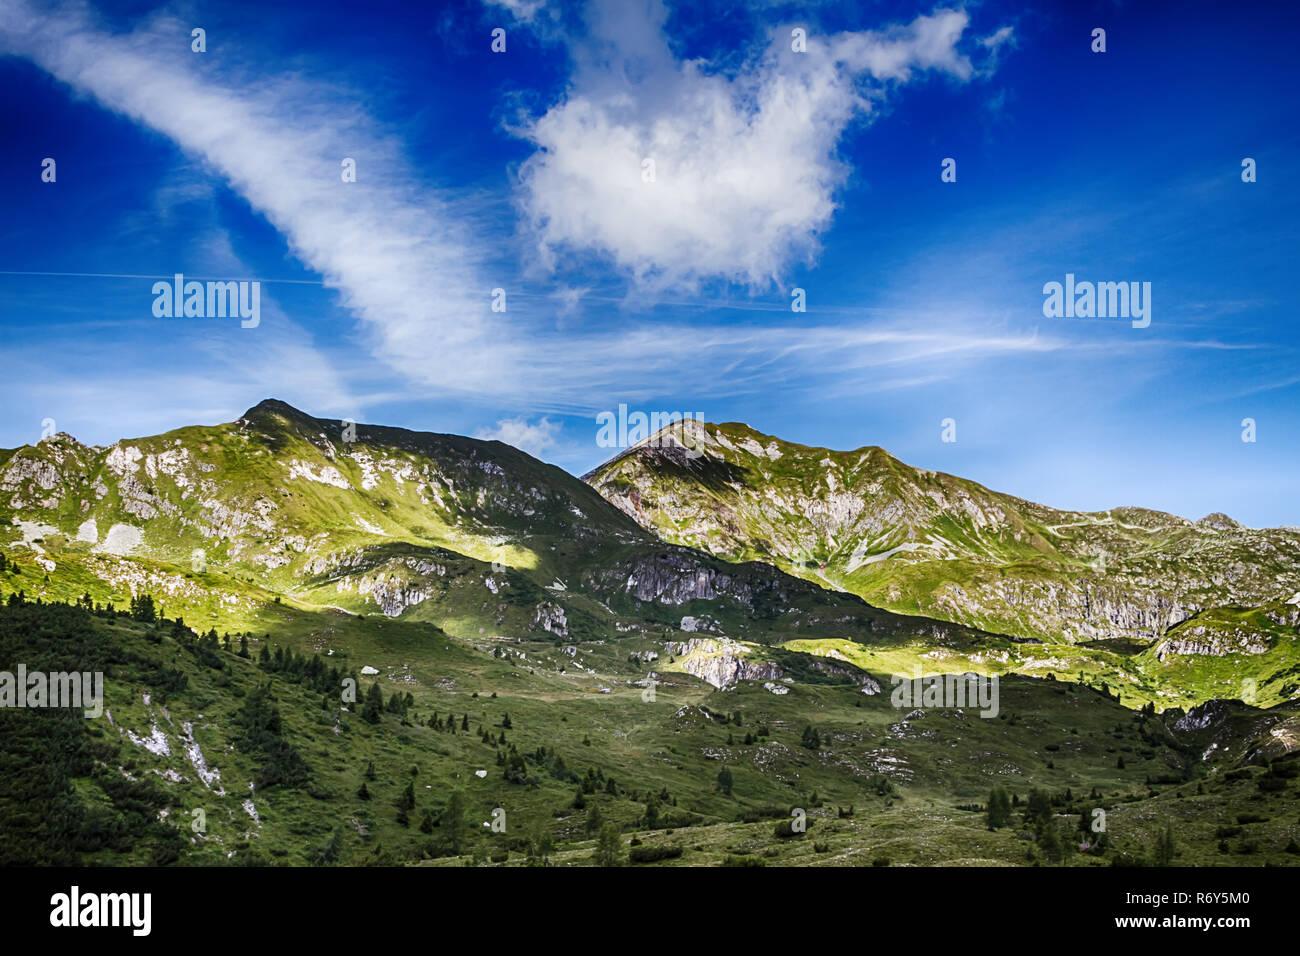 beautyfull mountain landscape in bagolino,brescia - Stock Image